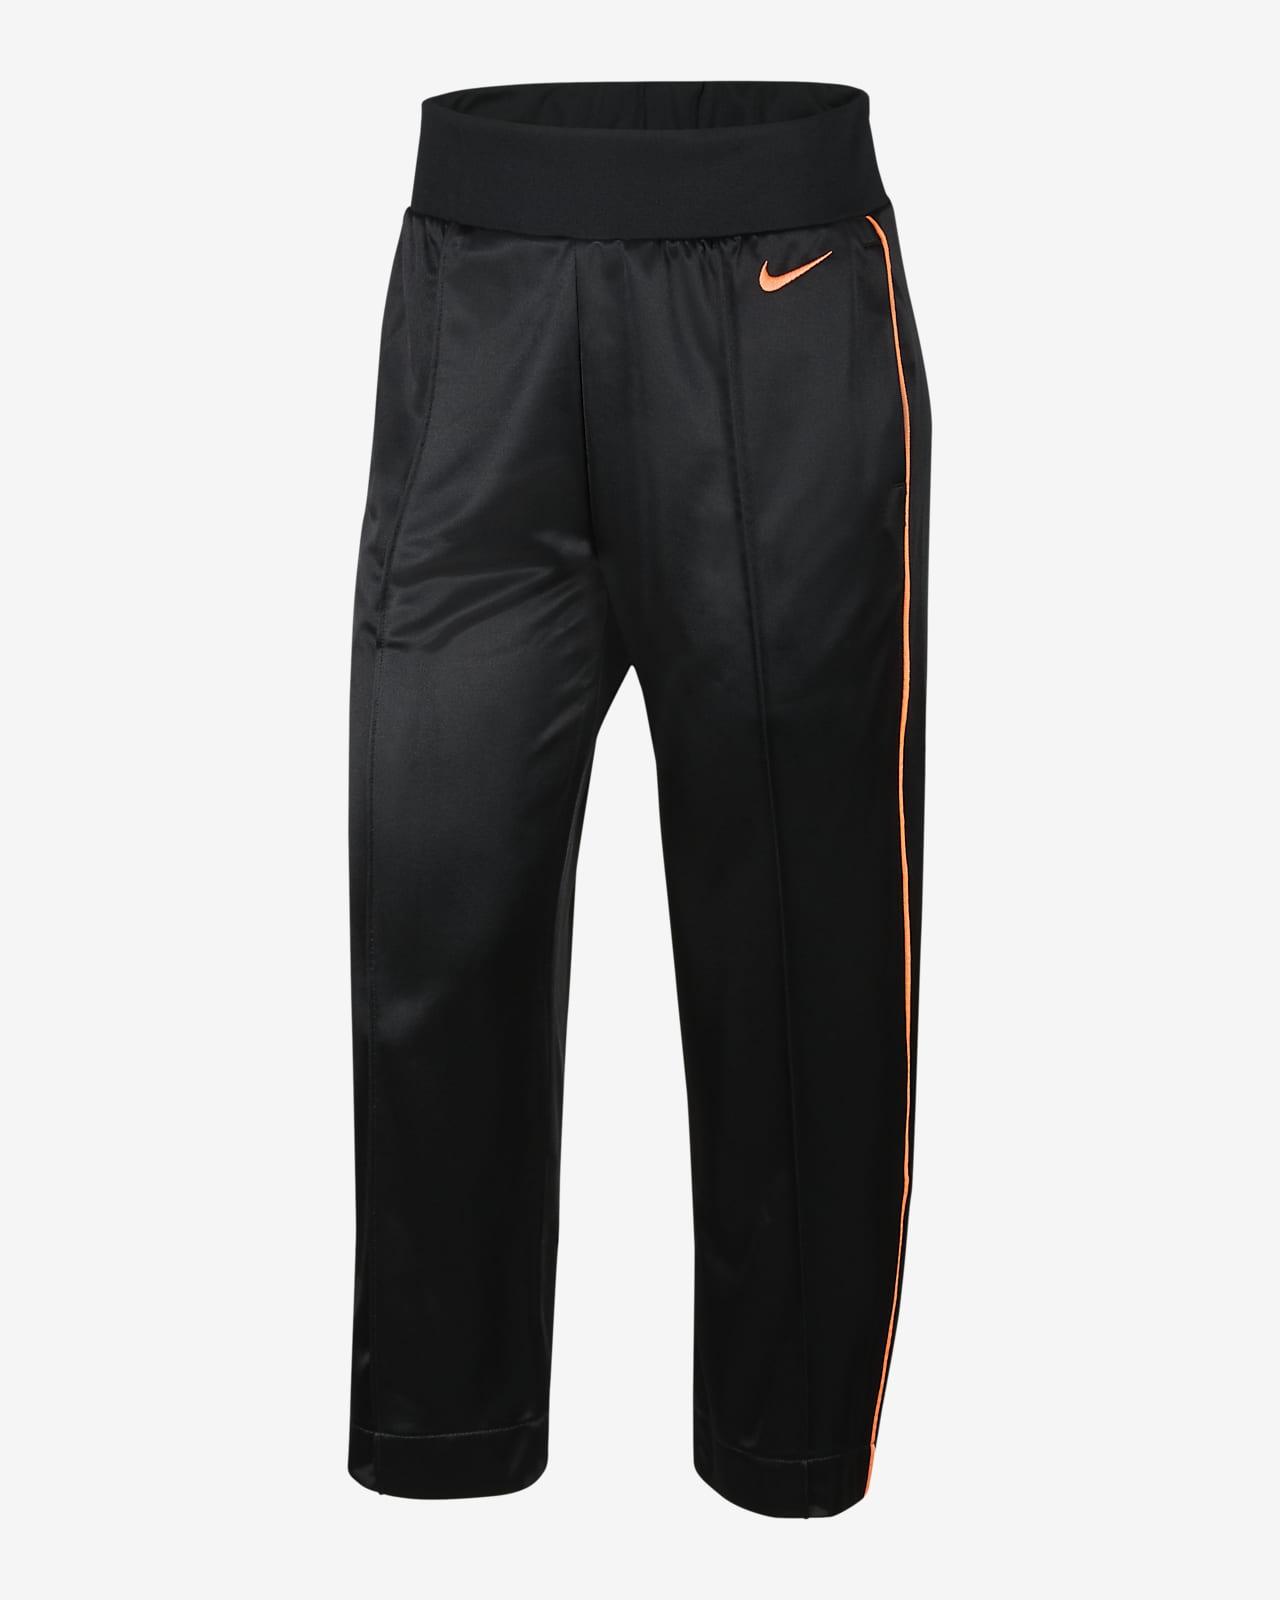 Nike Sportswear 女款長褲